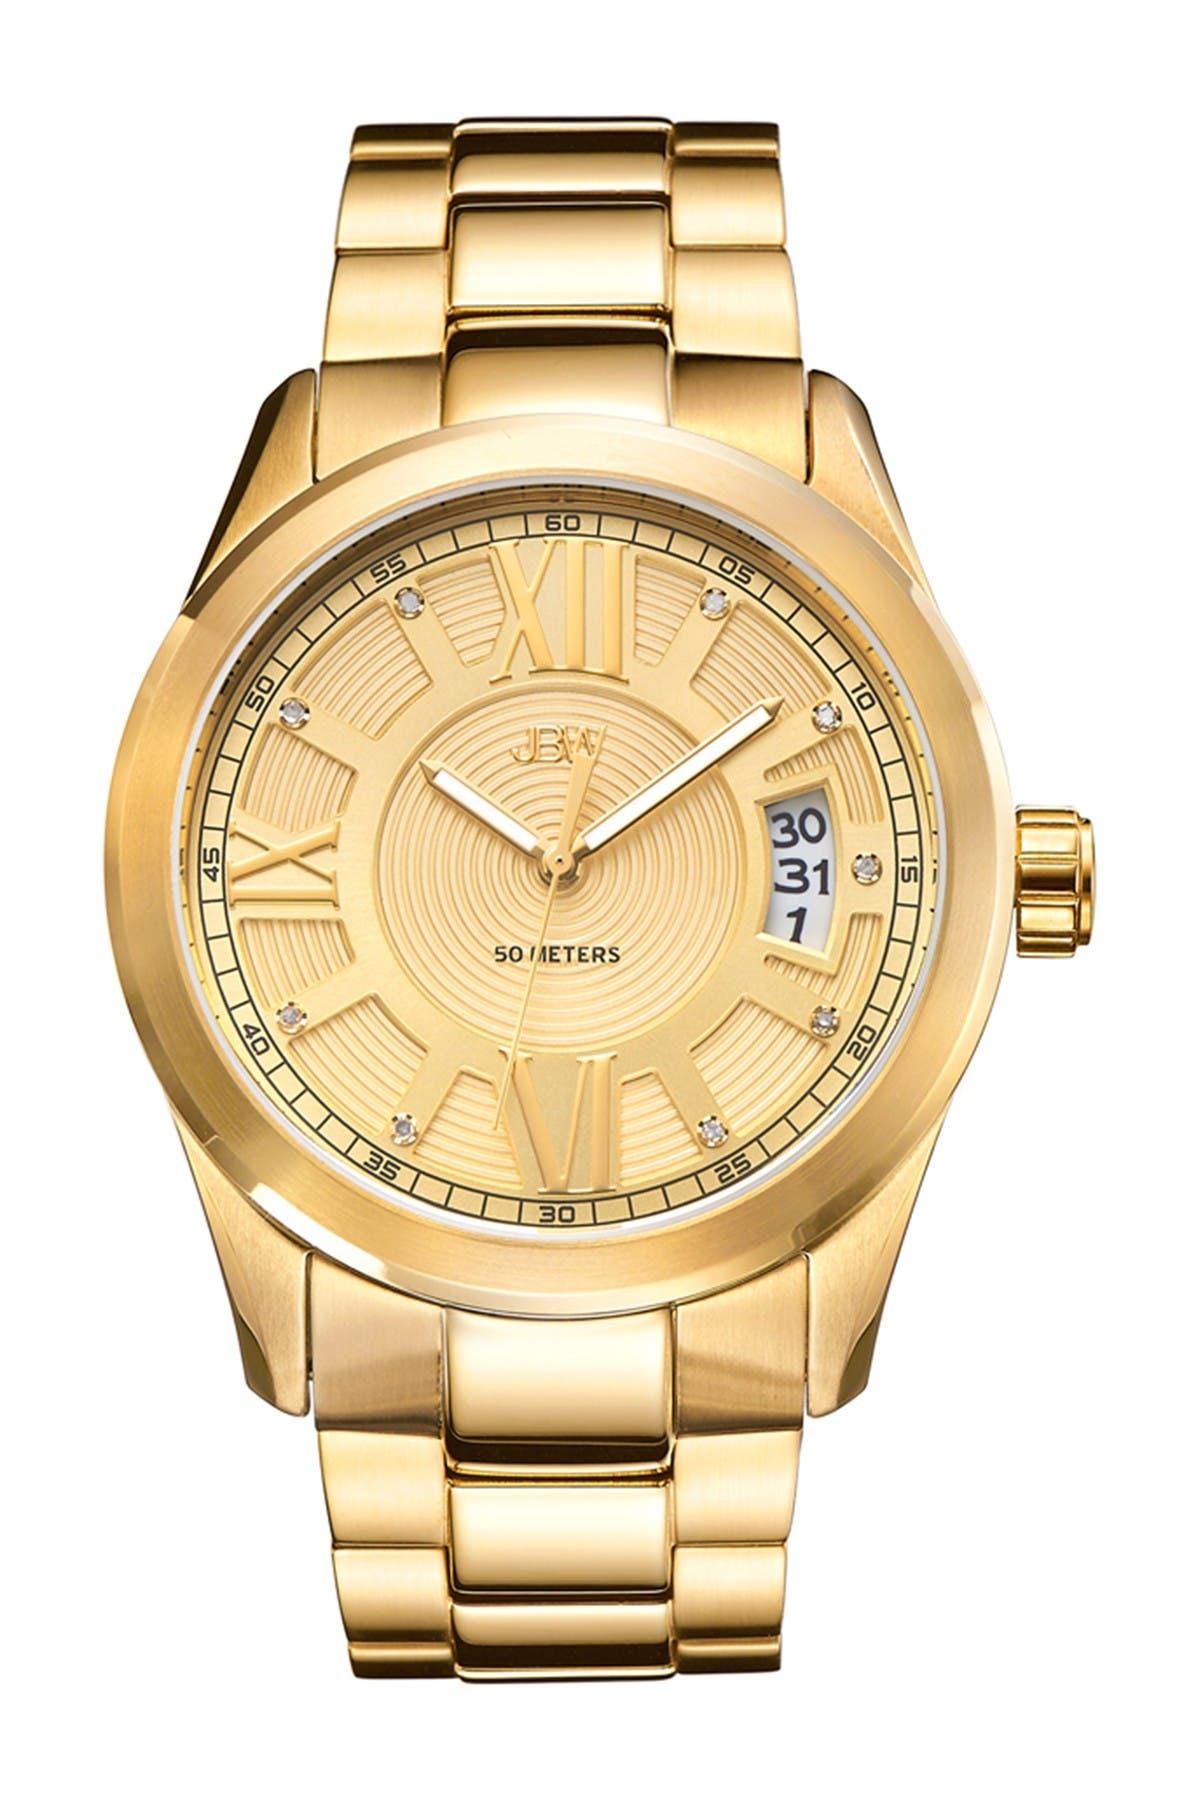 Image of JBW Men's Cristal Diamond Watch, 44mm - 0.09 ctw